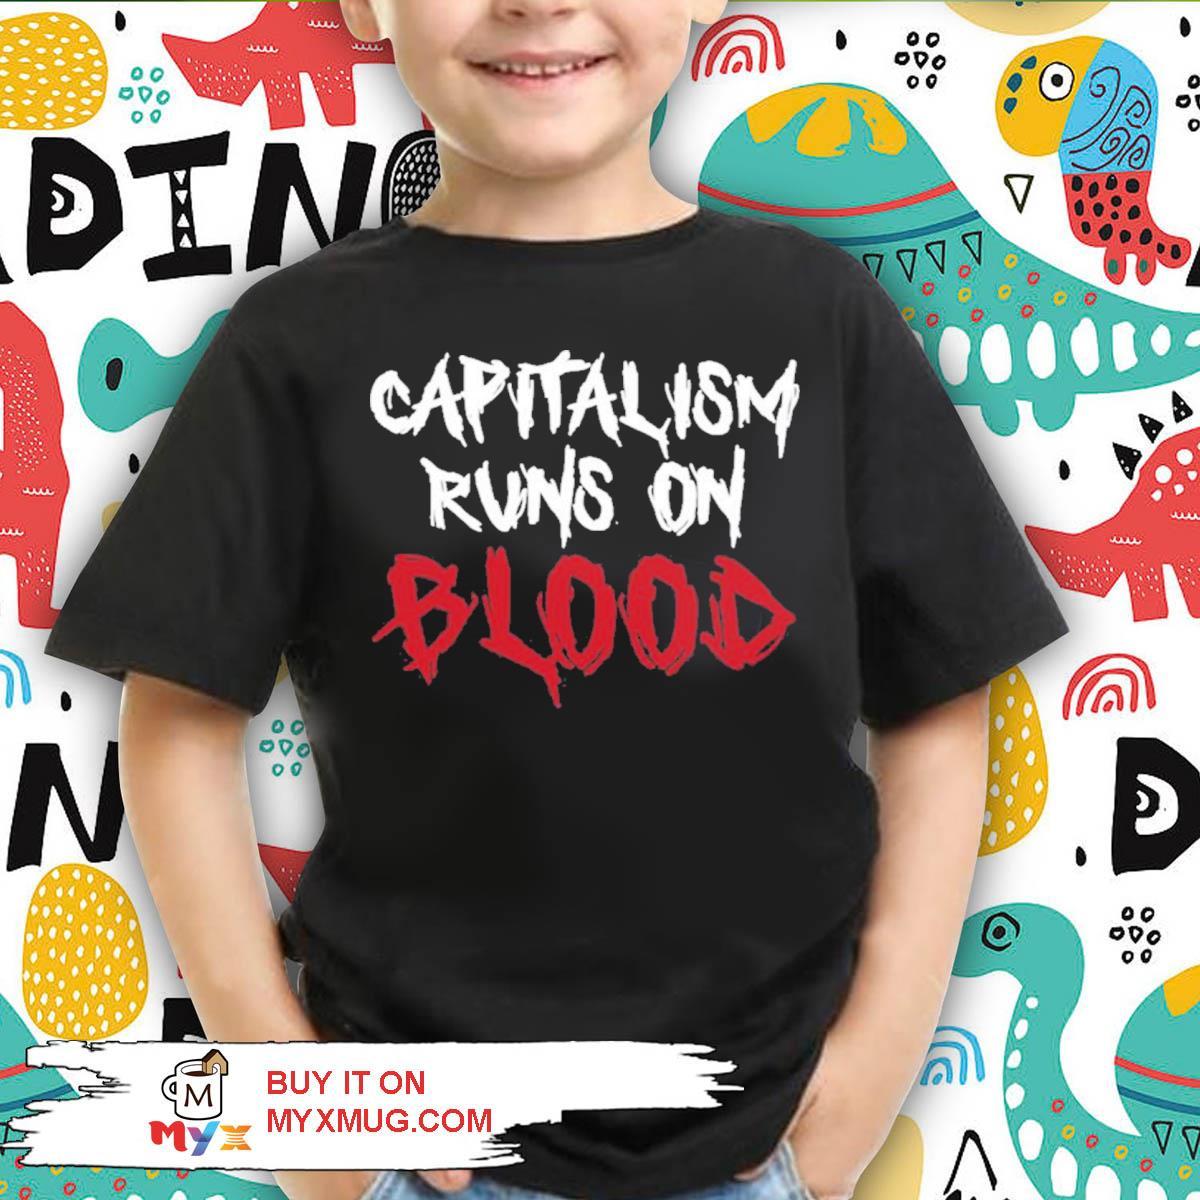 Capitalism runs on blood war is racket left flank vets merch capitalism runs on blood s kid shirt